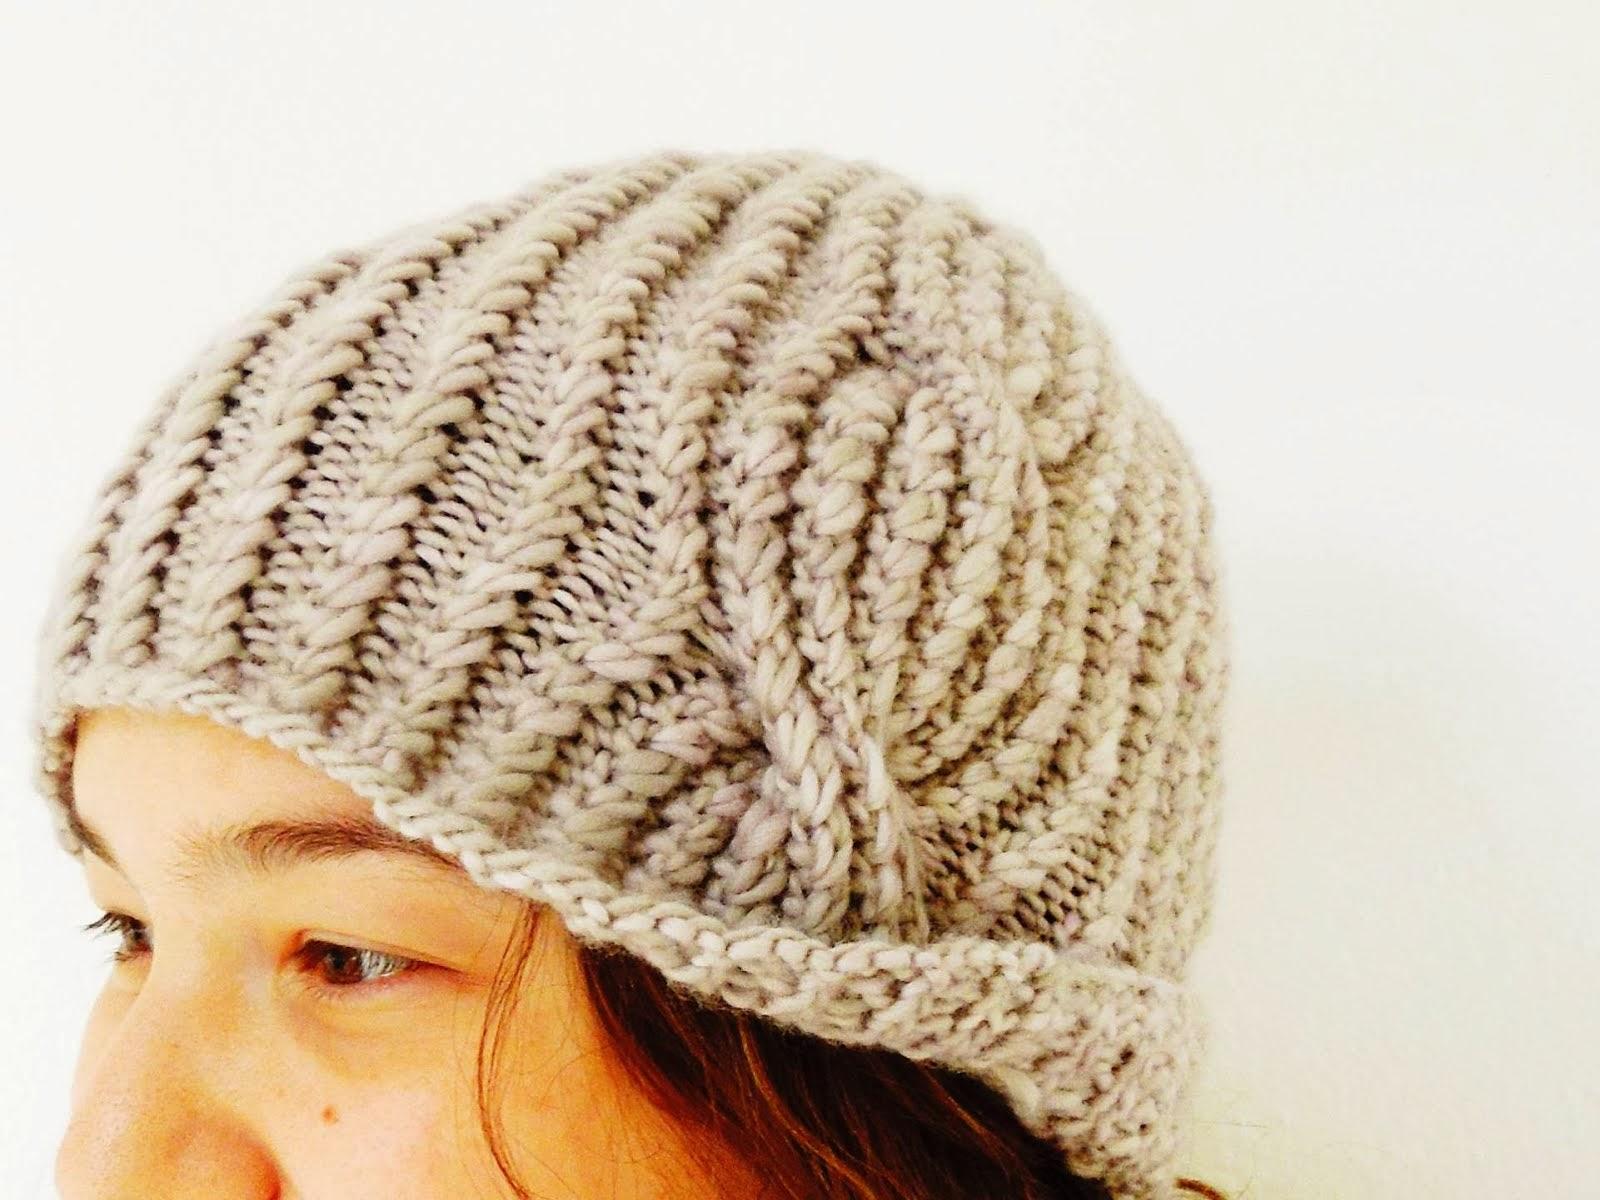 Pleksuda hat pattern - buy through Ravelry  //  σχεδιο για σκουφακι  - αγορα μεσω Ravelry €2,90